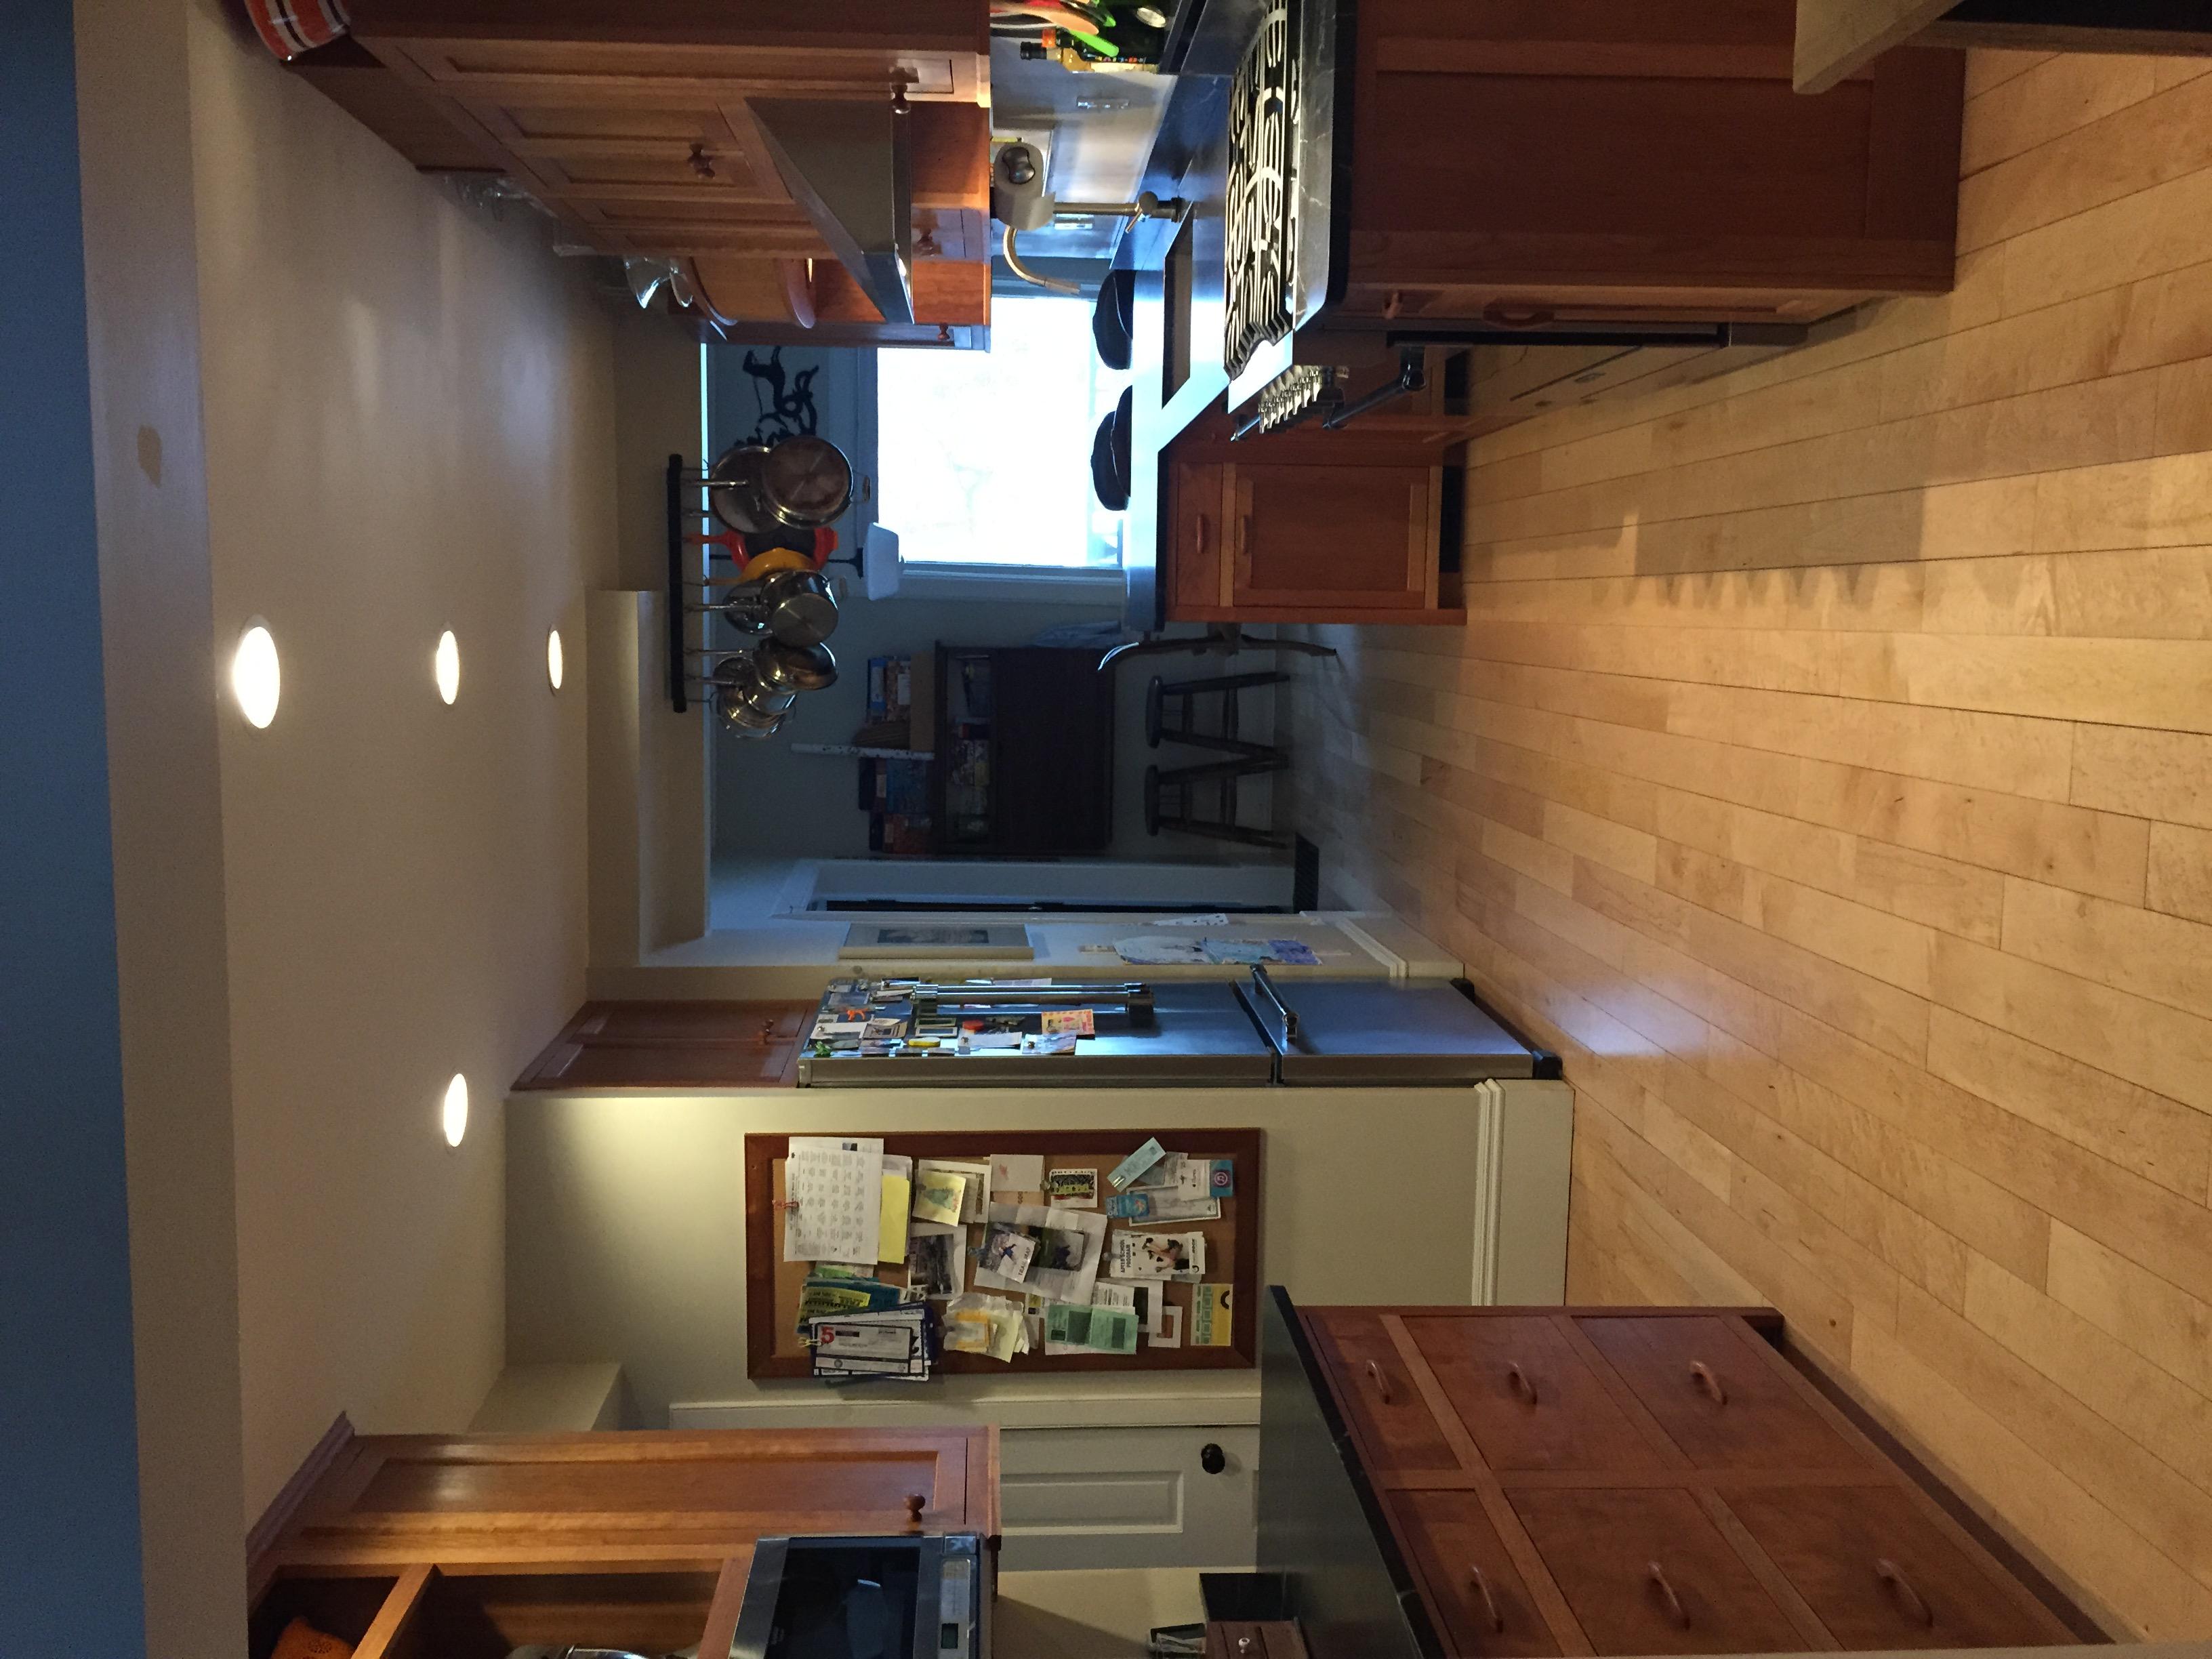 Inset Cherry Kitchen--Full View